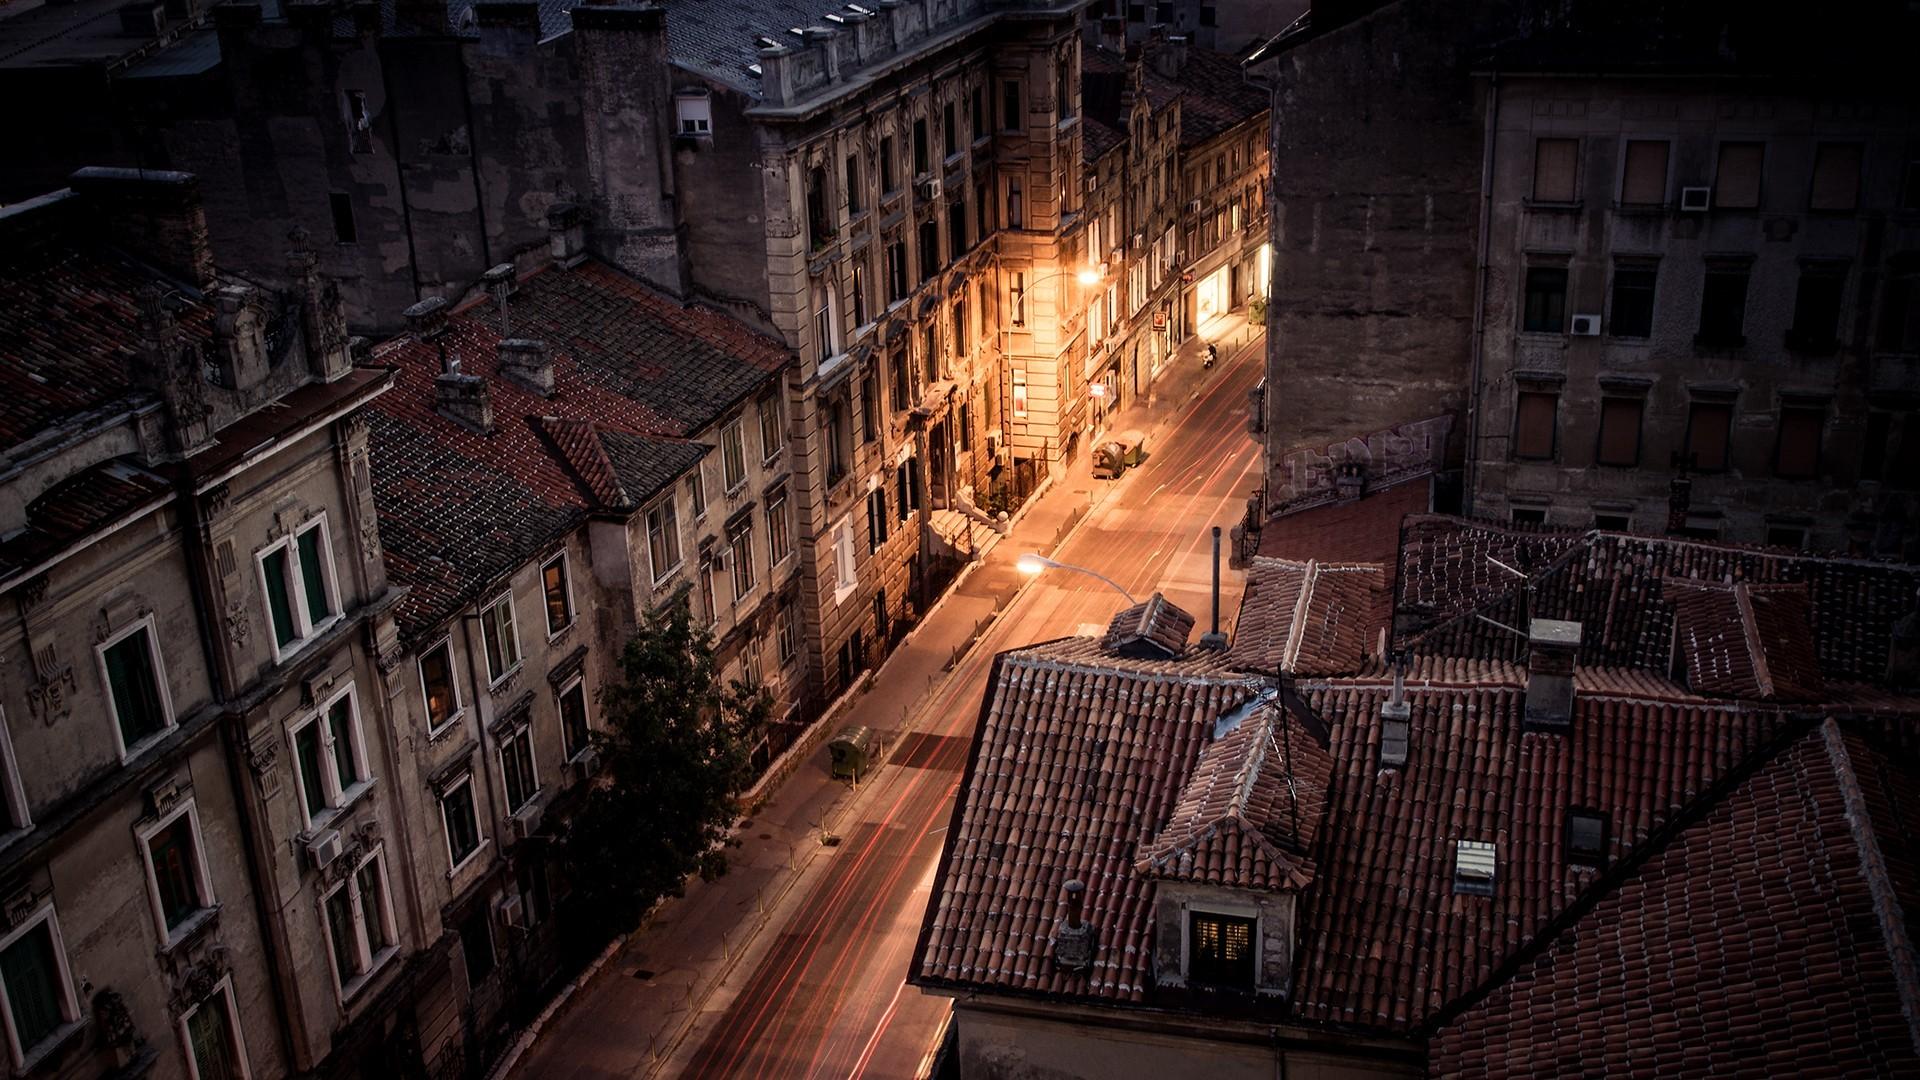 Road: Street, City, Building